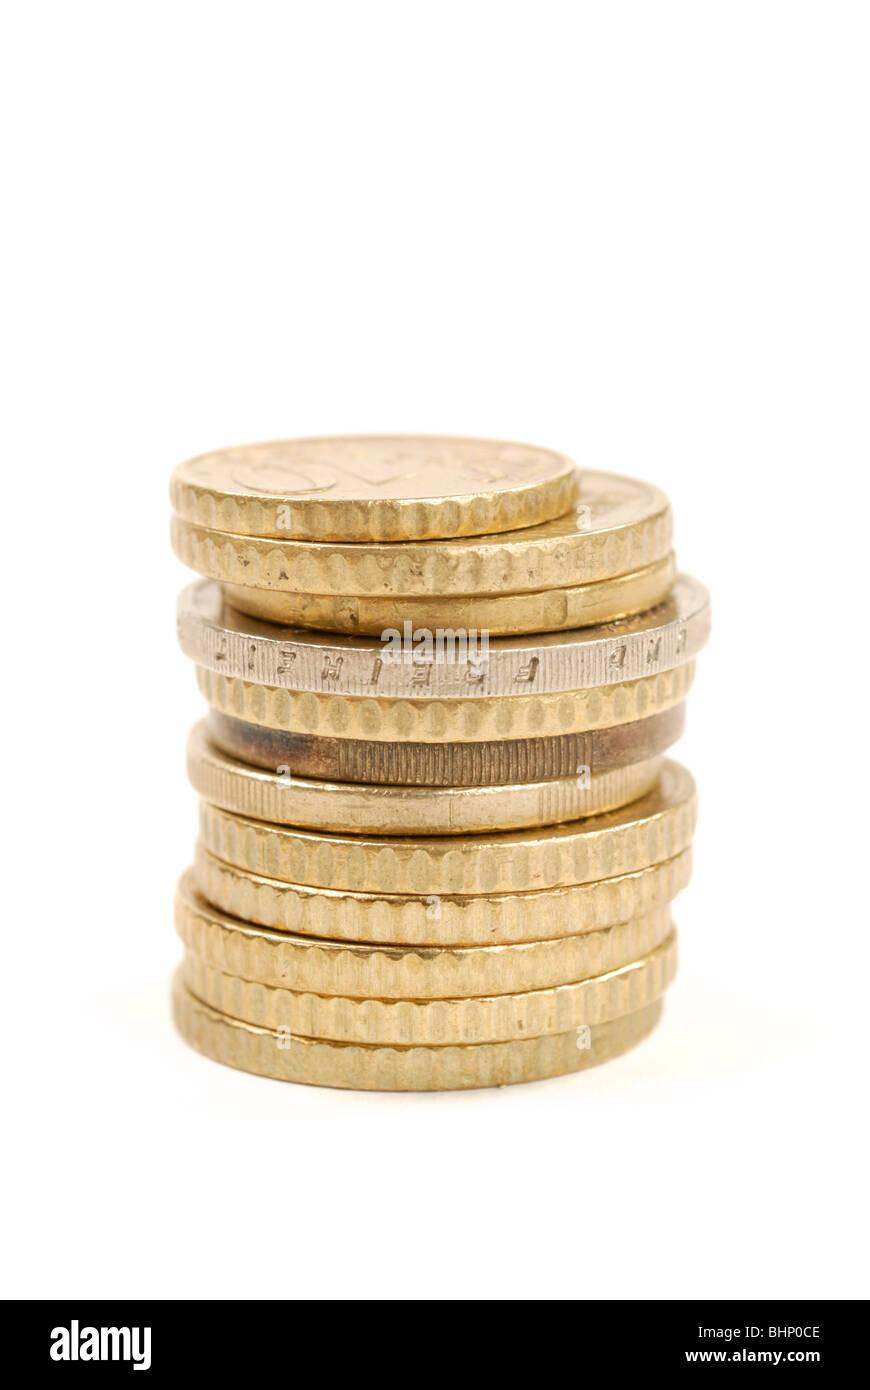 Euro cents - Stock Image